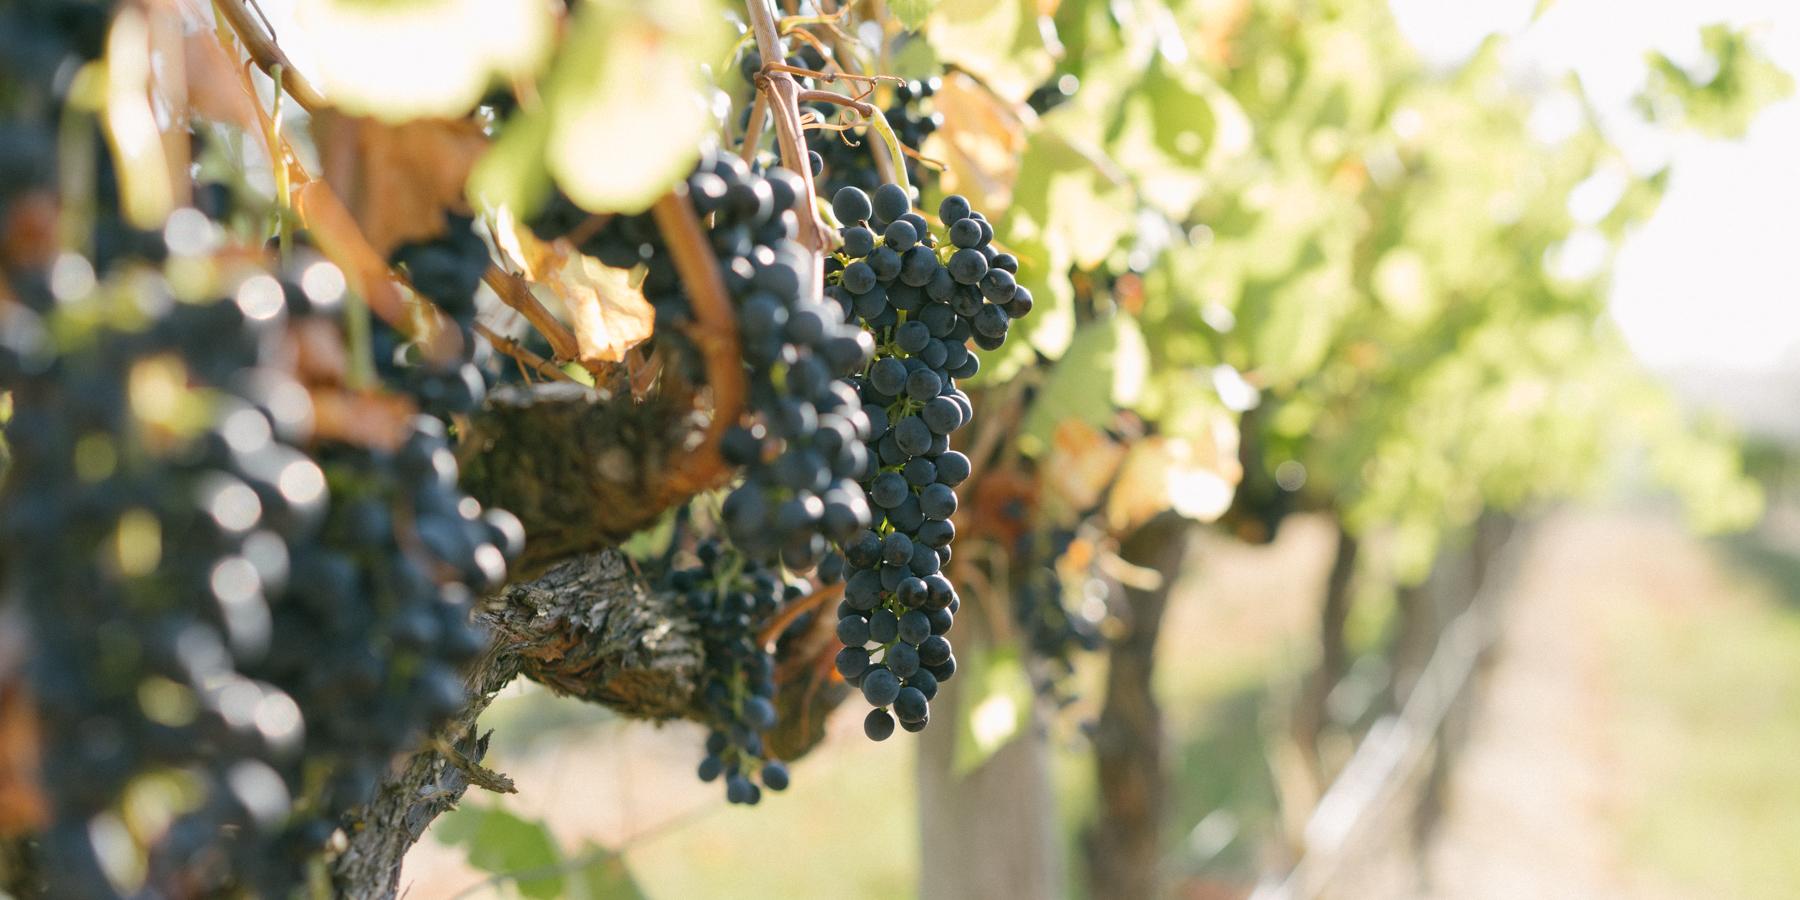 chirping-bird-shiraz-grapes-bright.jpg